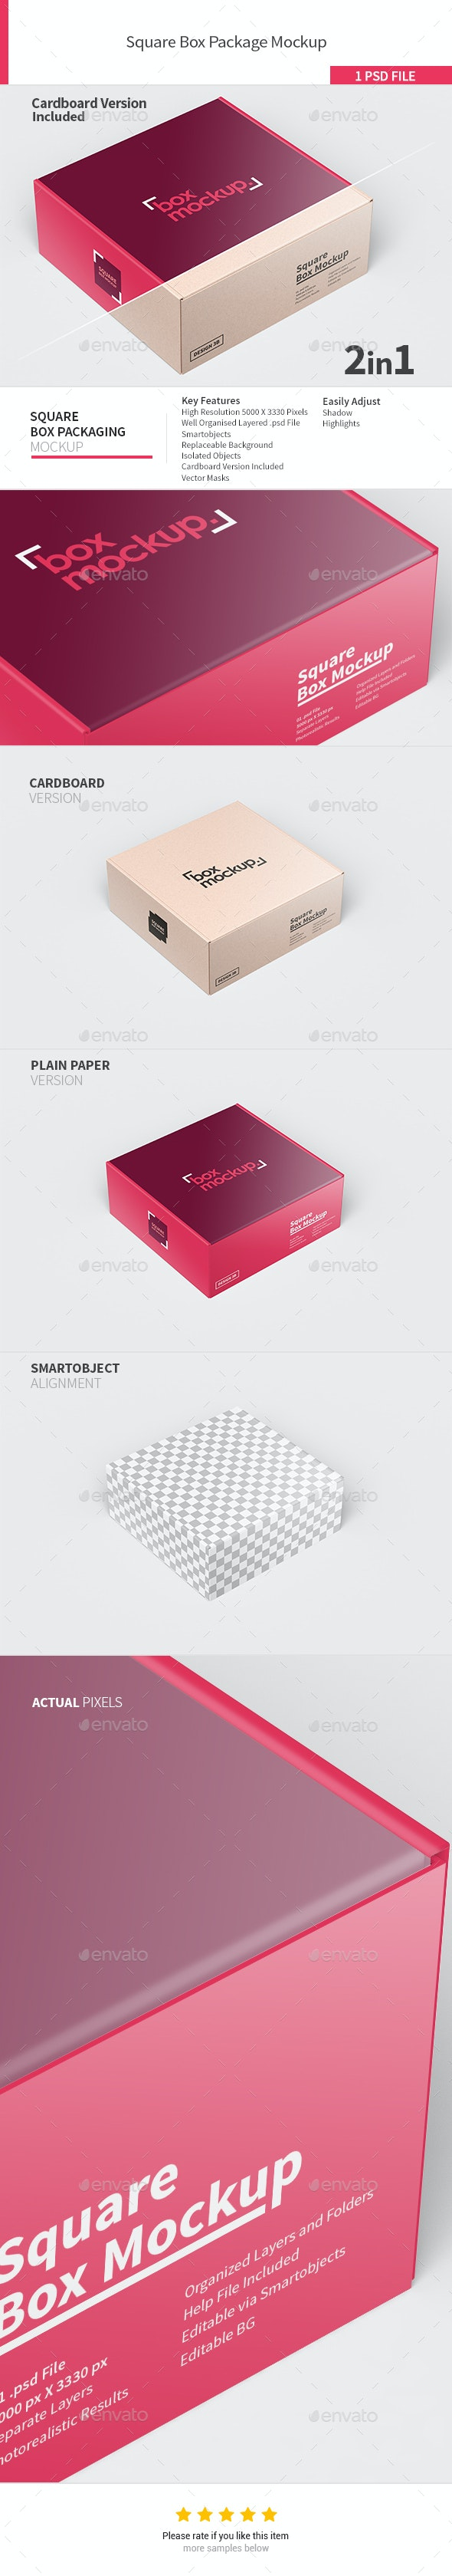 Square Box Packaging Mockup - Product Mock-Ups Graphics